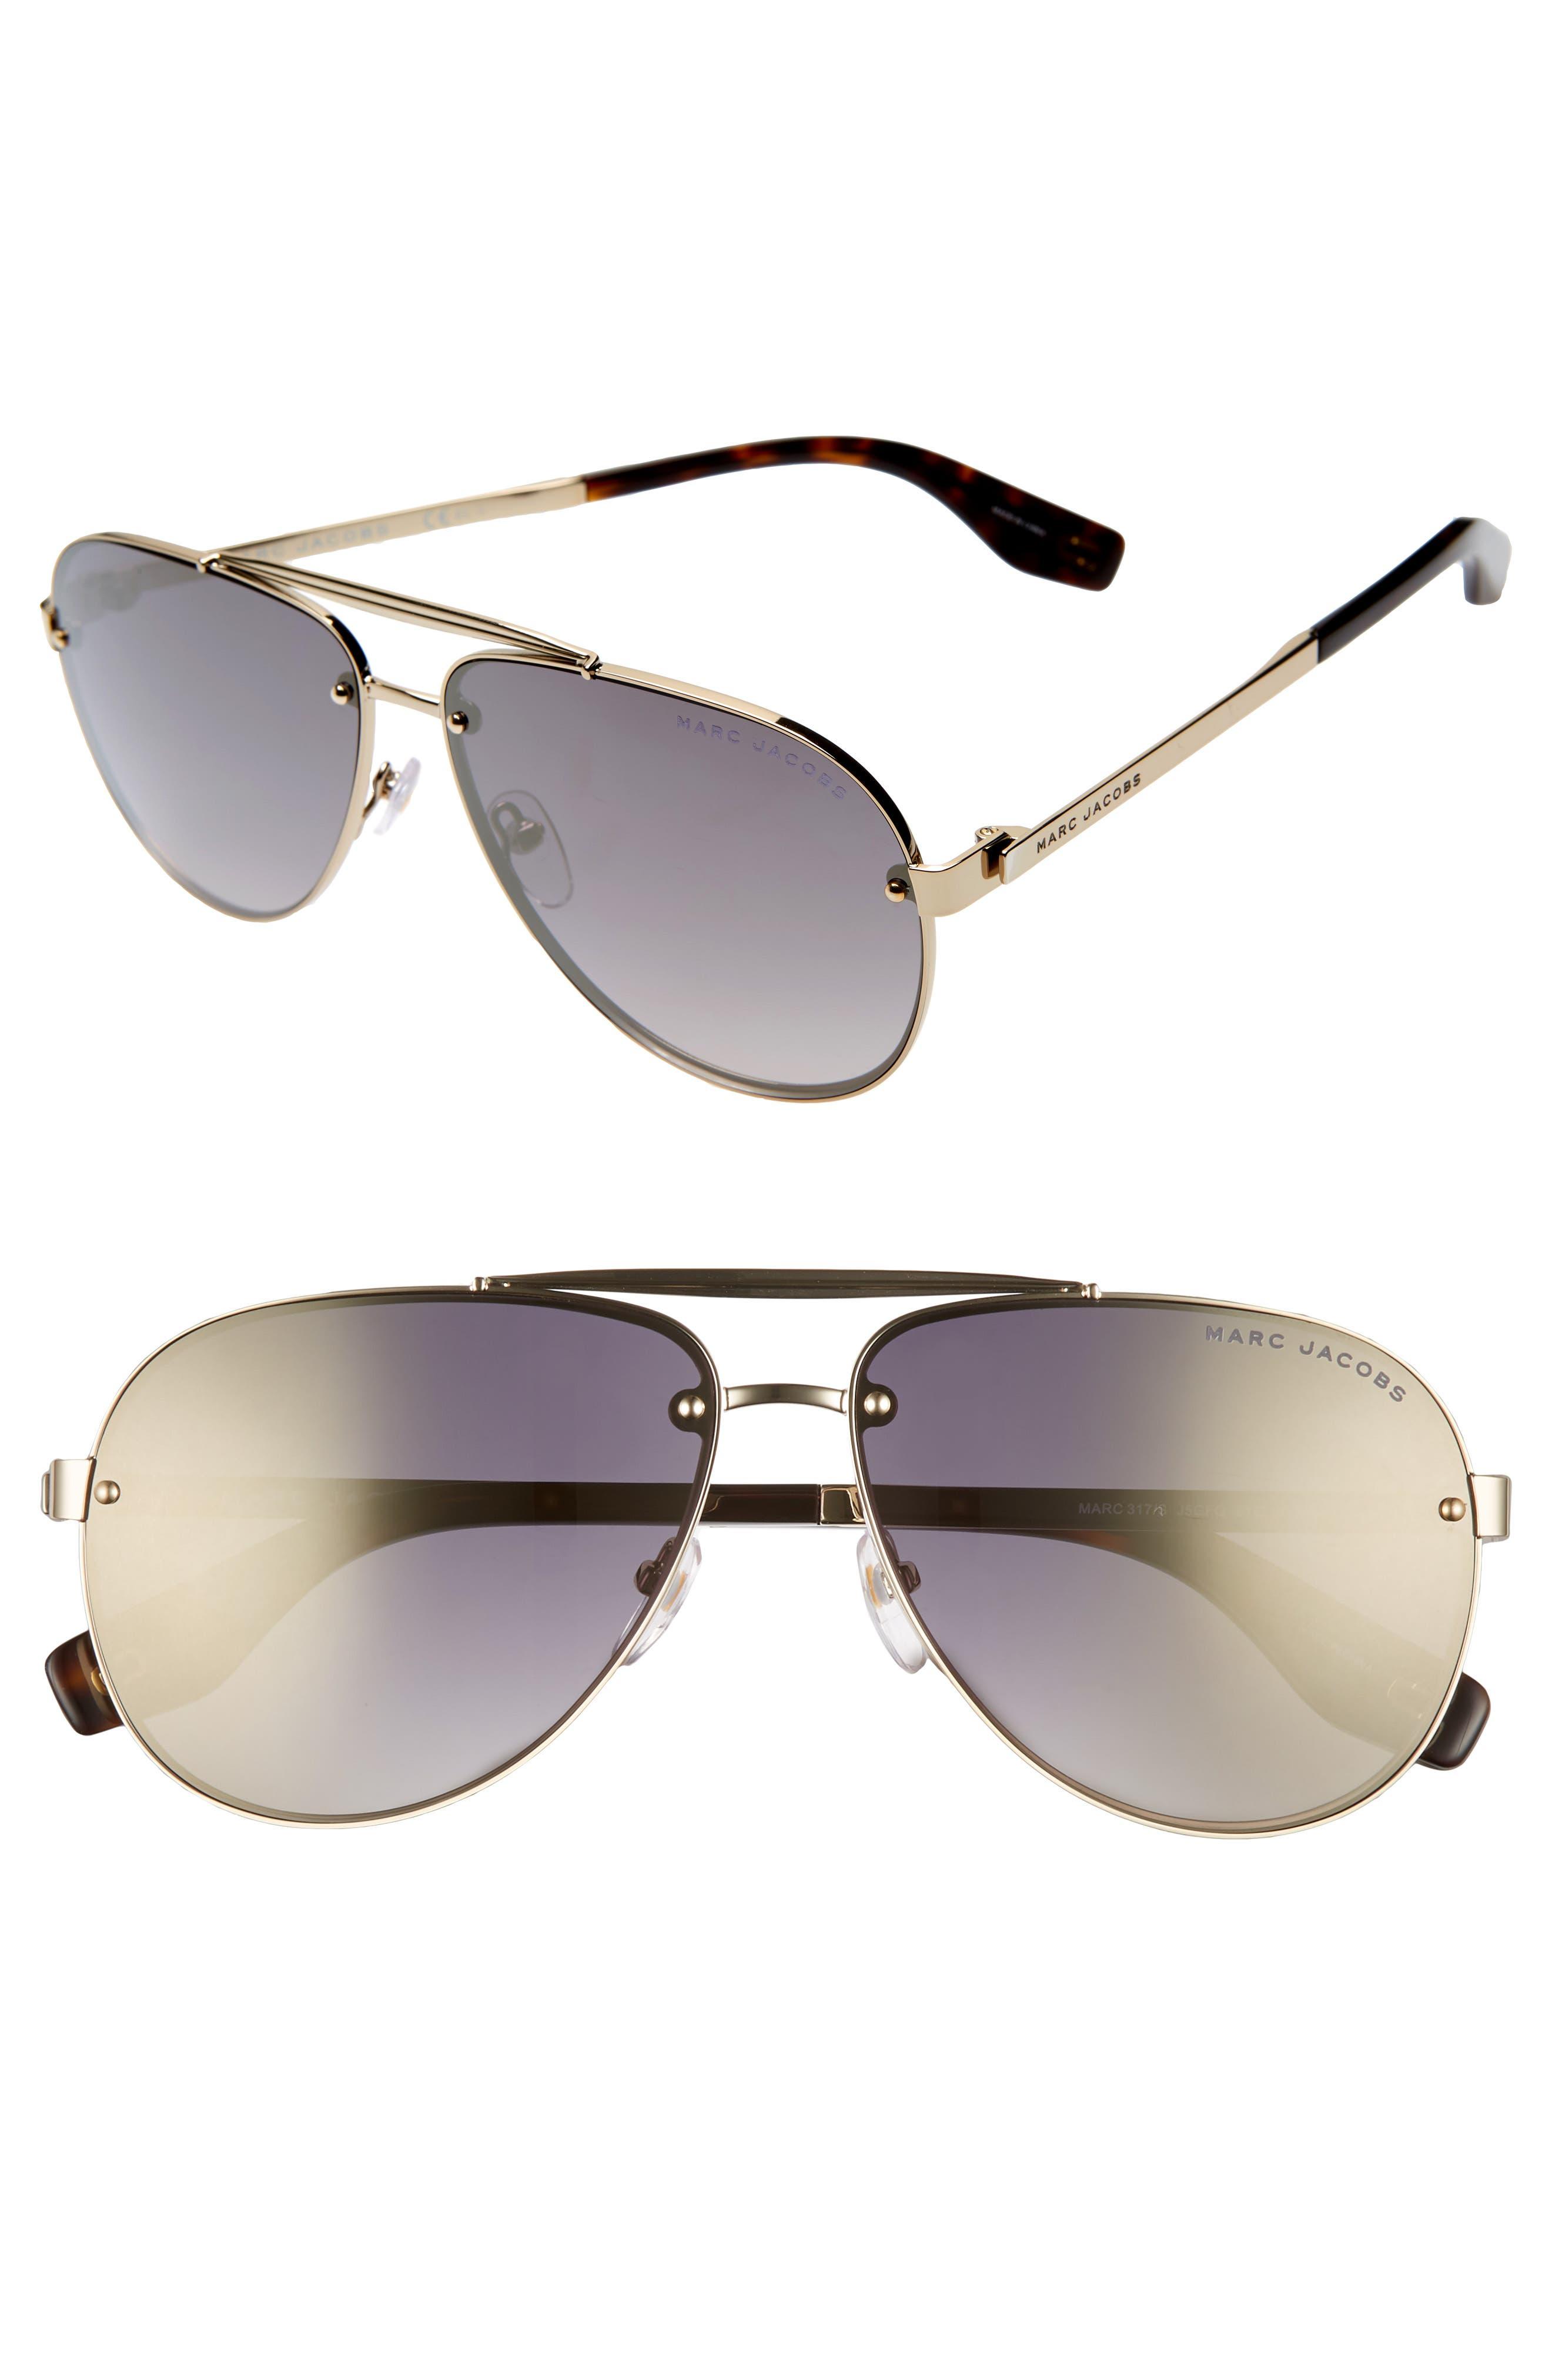 c9f761c9e5 MARC JACOBS Aviator Sunglasses